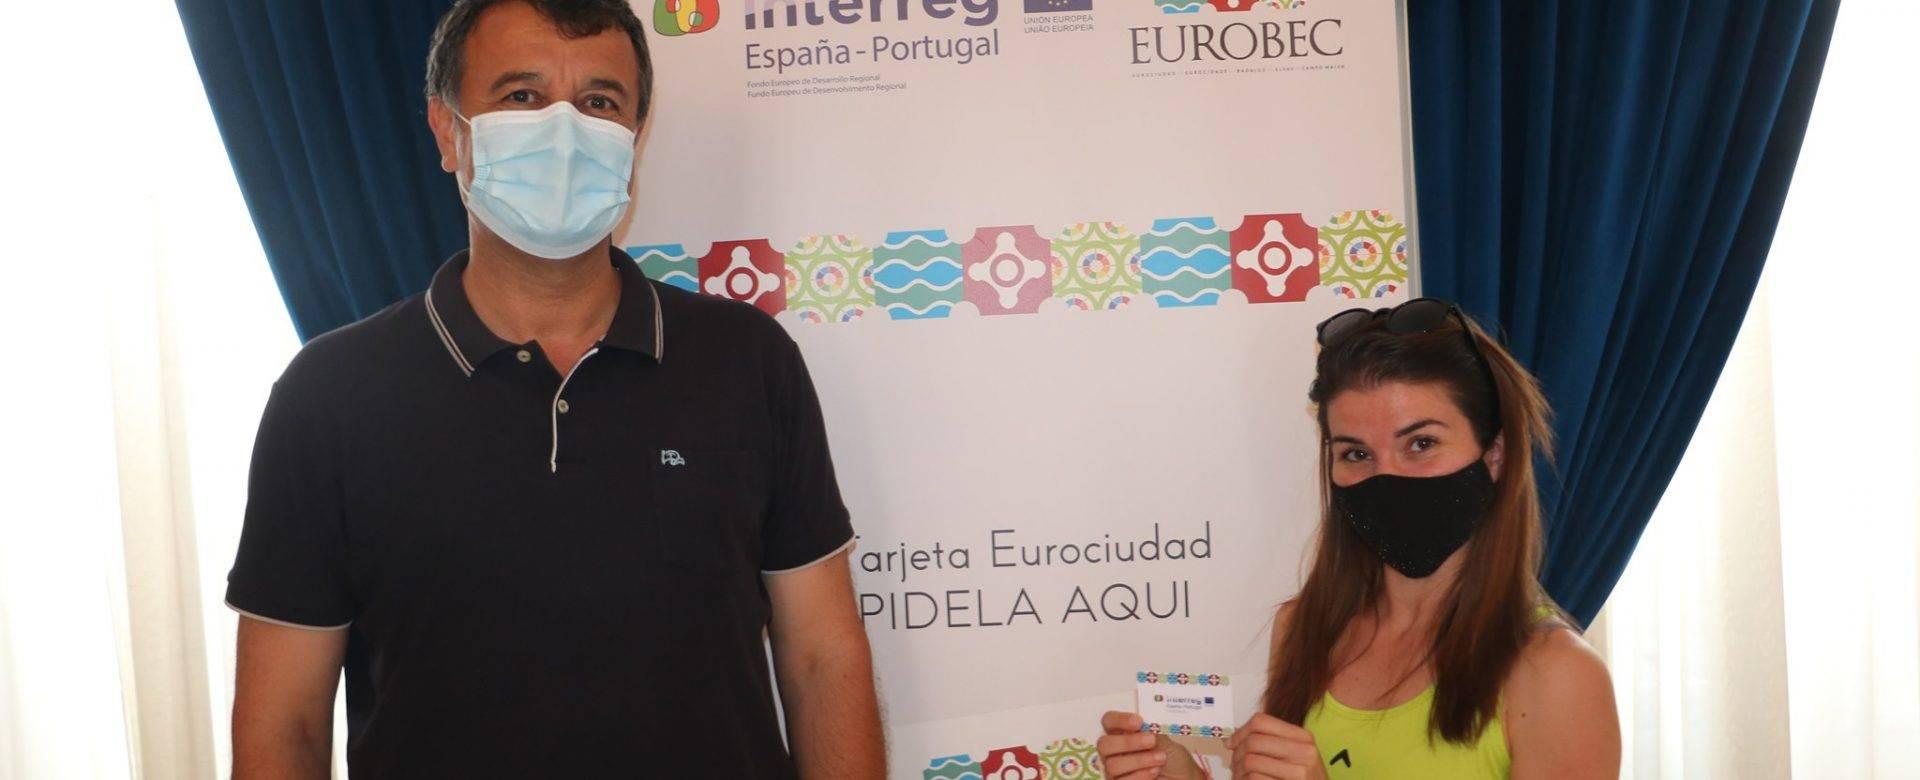 Primera tarjeta EuroBEC entregada en Campo Maior